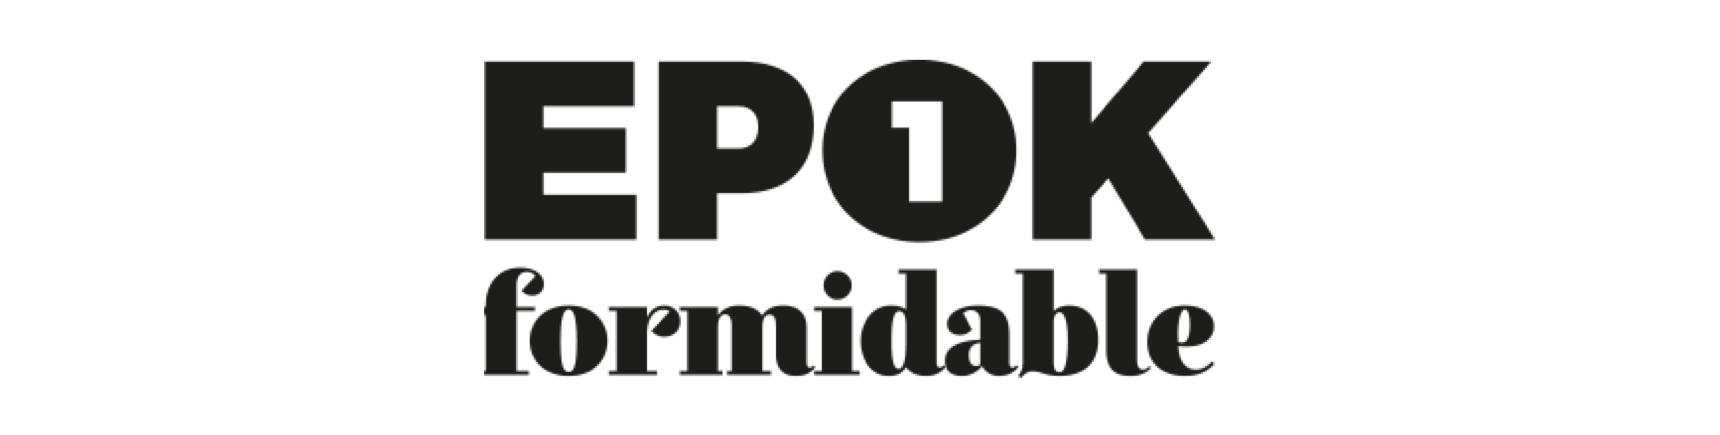 logo-1-epok-formidable.png